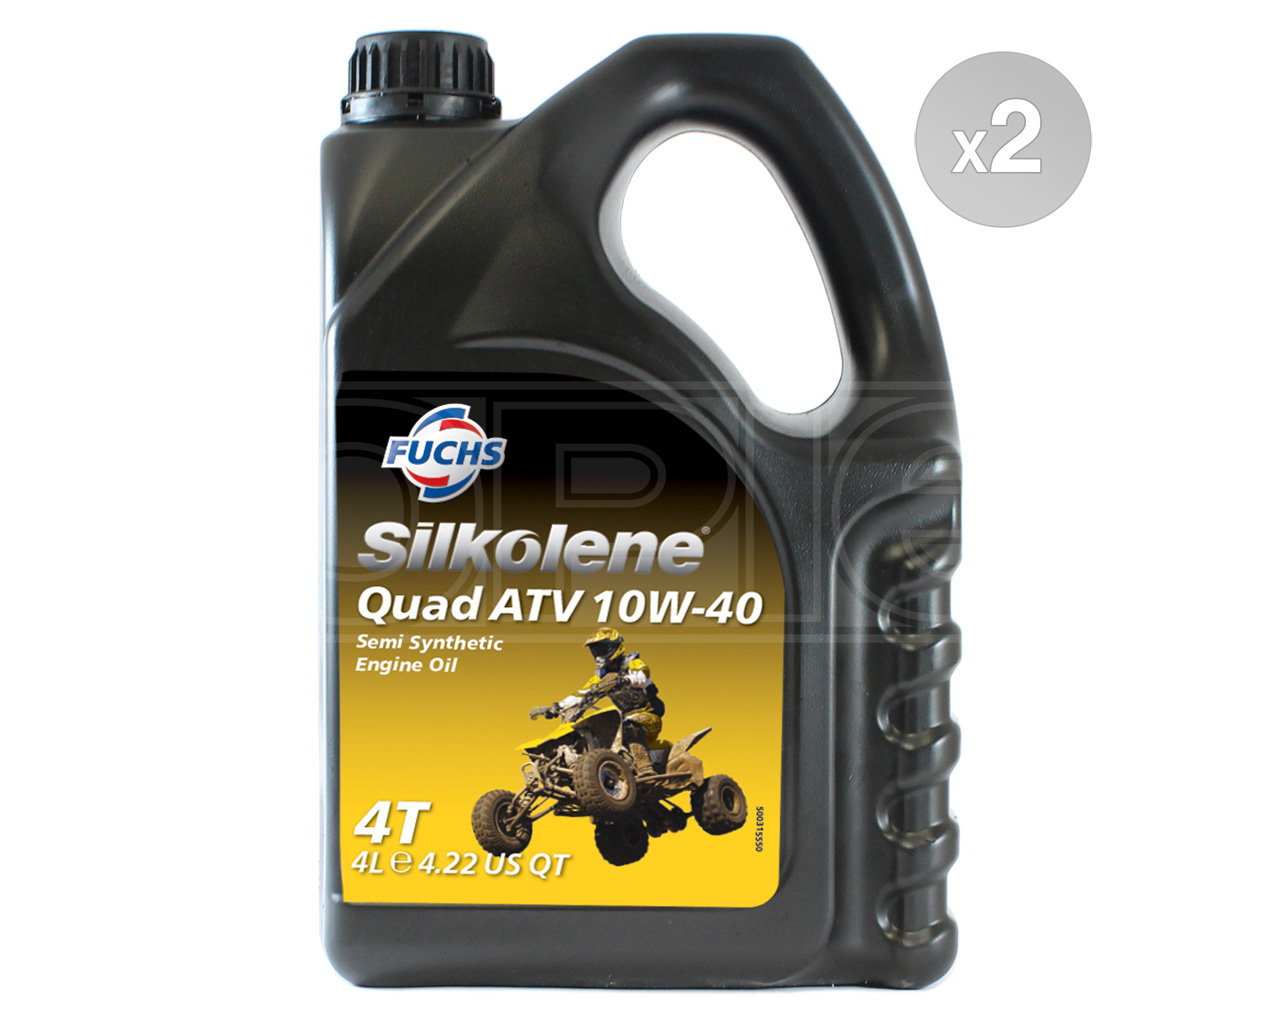 Silkolene QUAD ATV 10W-40 Semi-Synthetic 4T Engine Oil